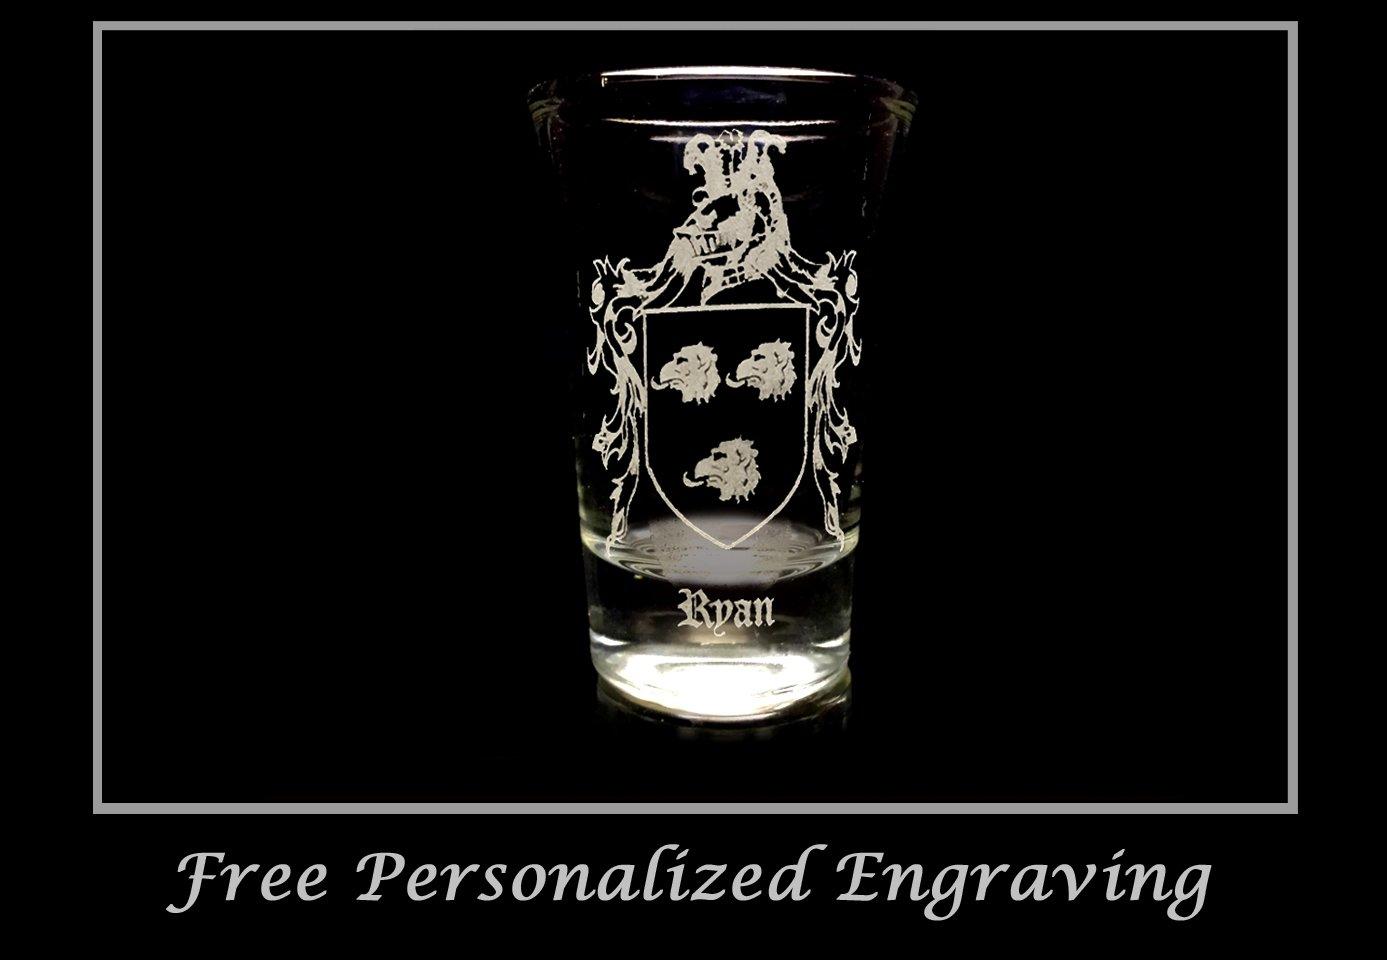 Irish Glass Free Personalized Engraving Ryan Irish Family Coat of Arms Shot Glass 2oz Set of 6 Celtic Decor